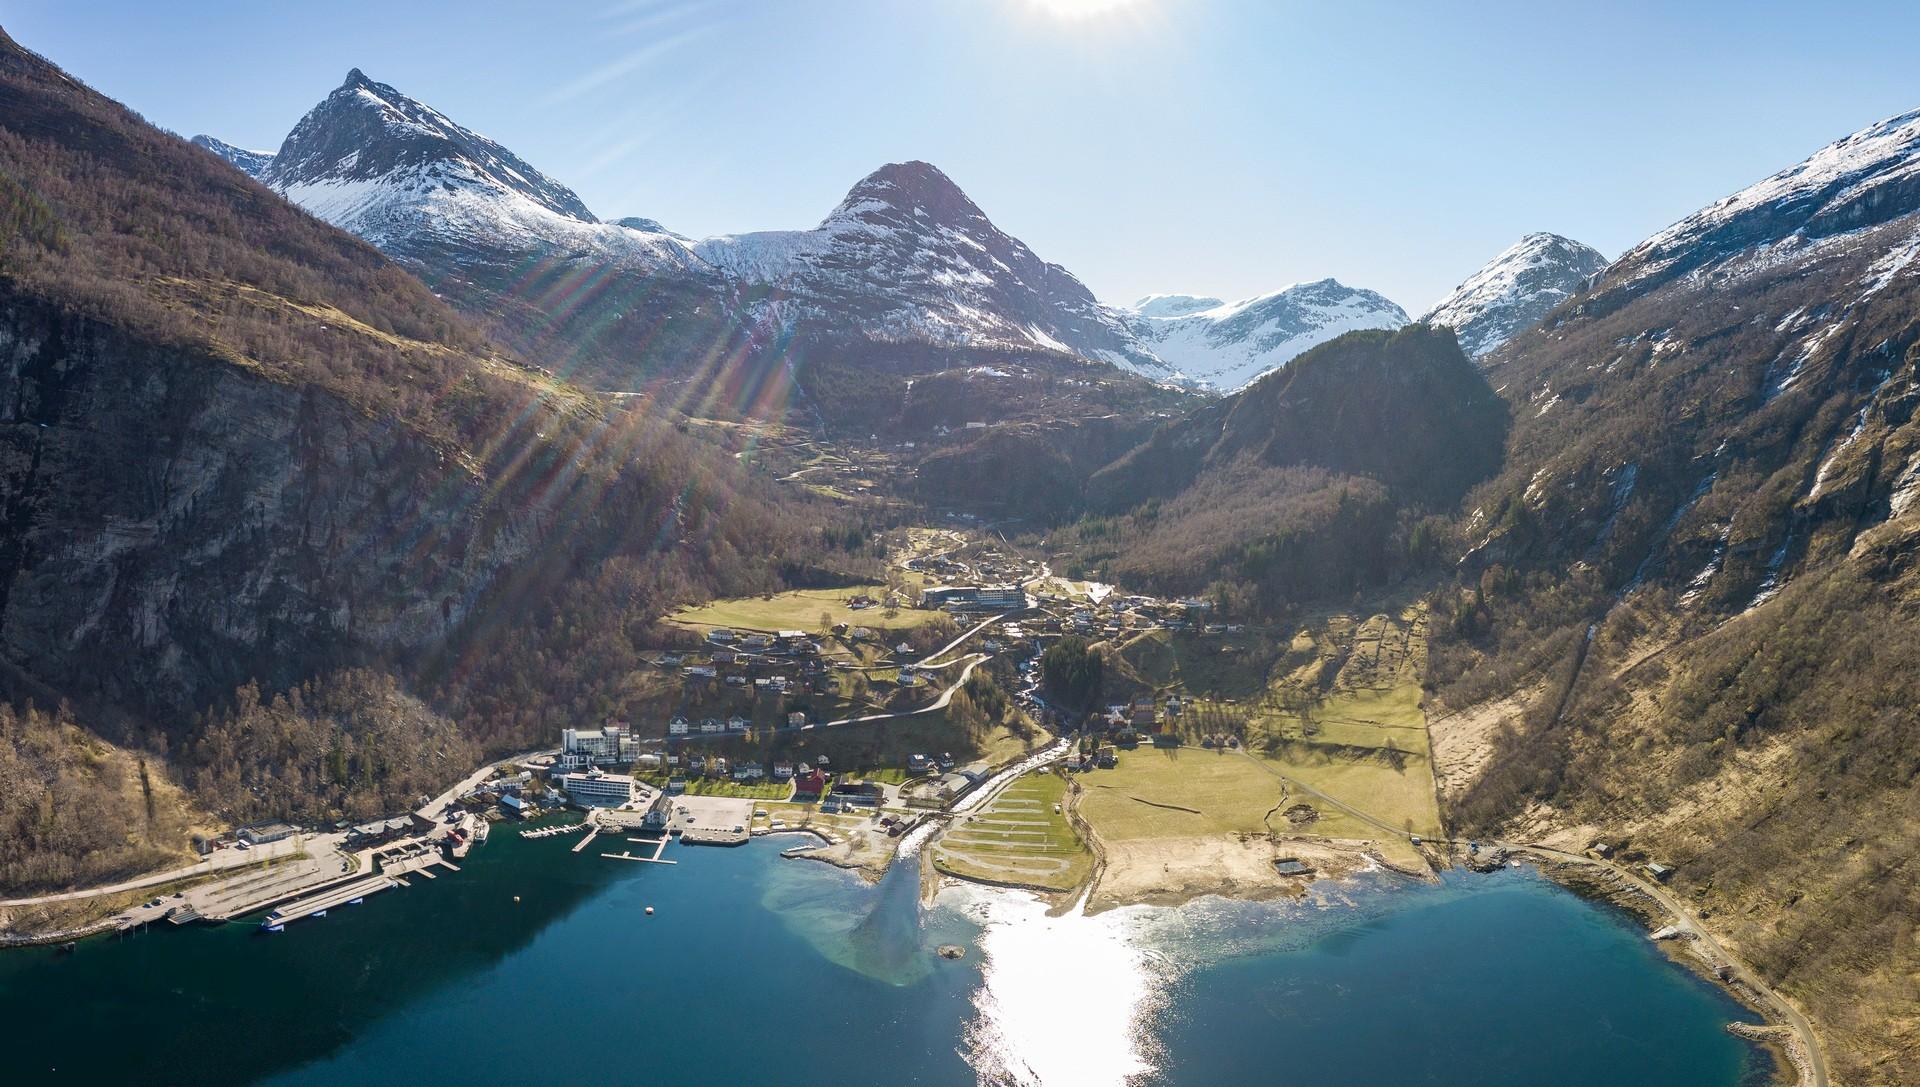 Drohne Panorama Norwegen Geiranger Fjord Reisefotografie